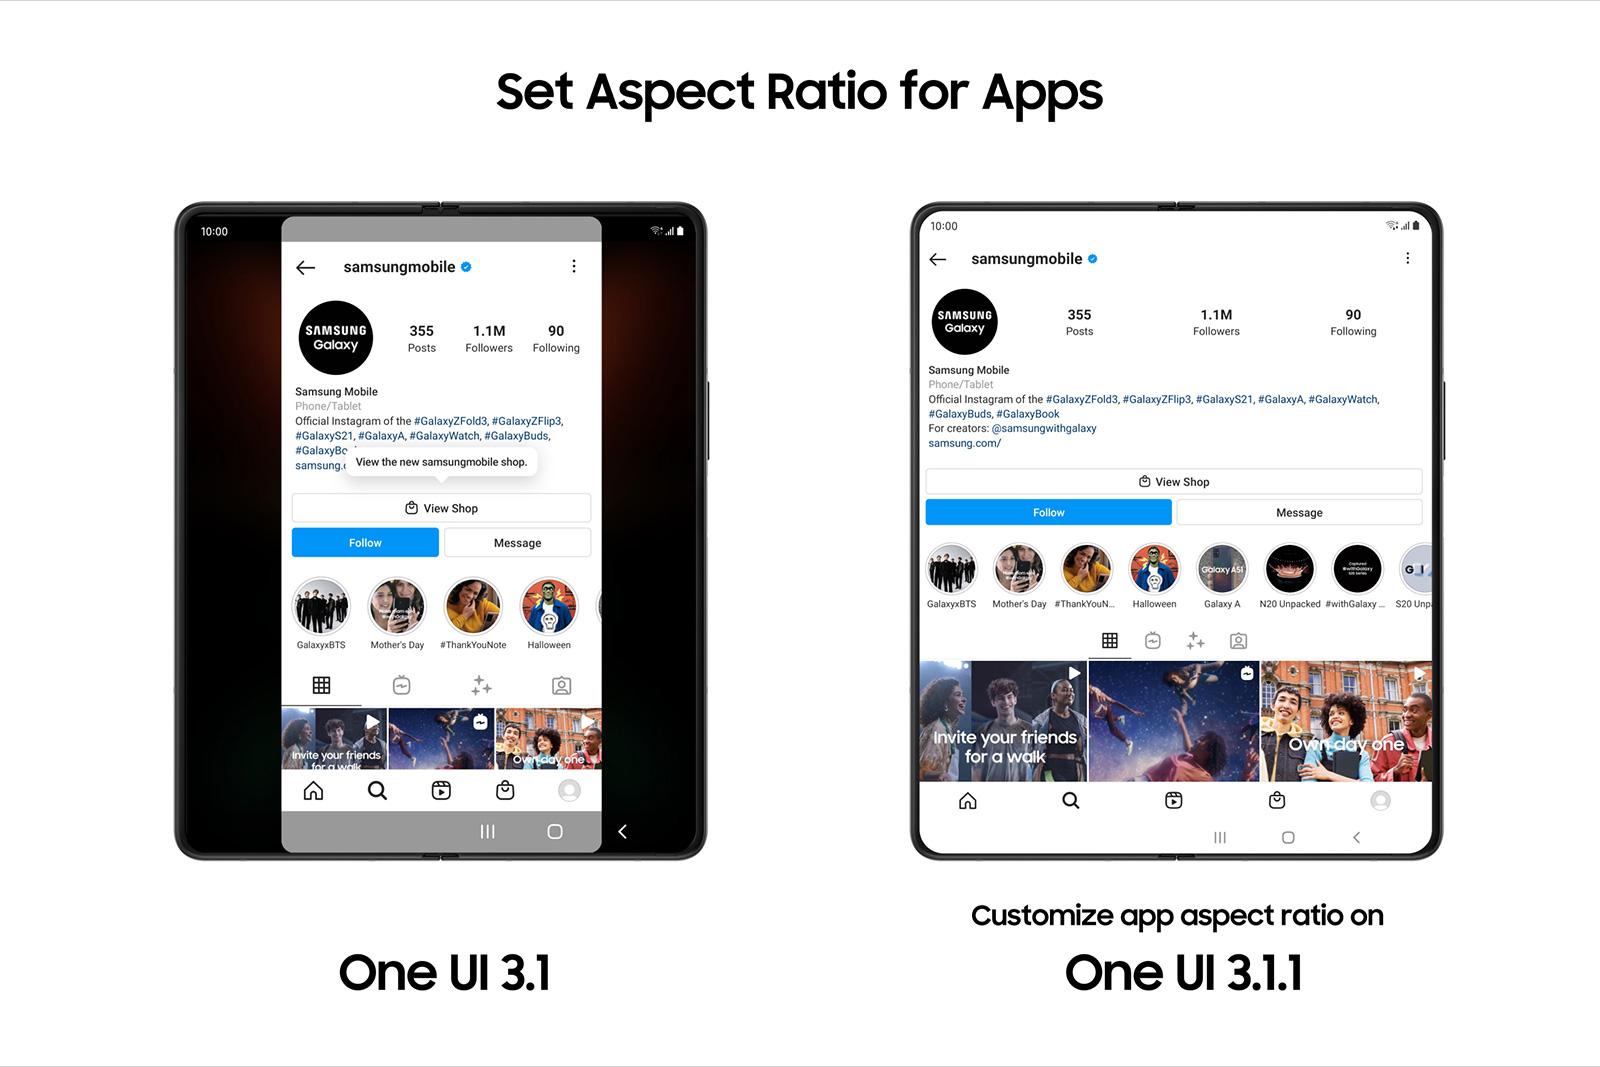 Samsung One UI 3.1.1